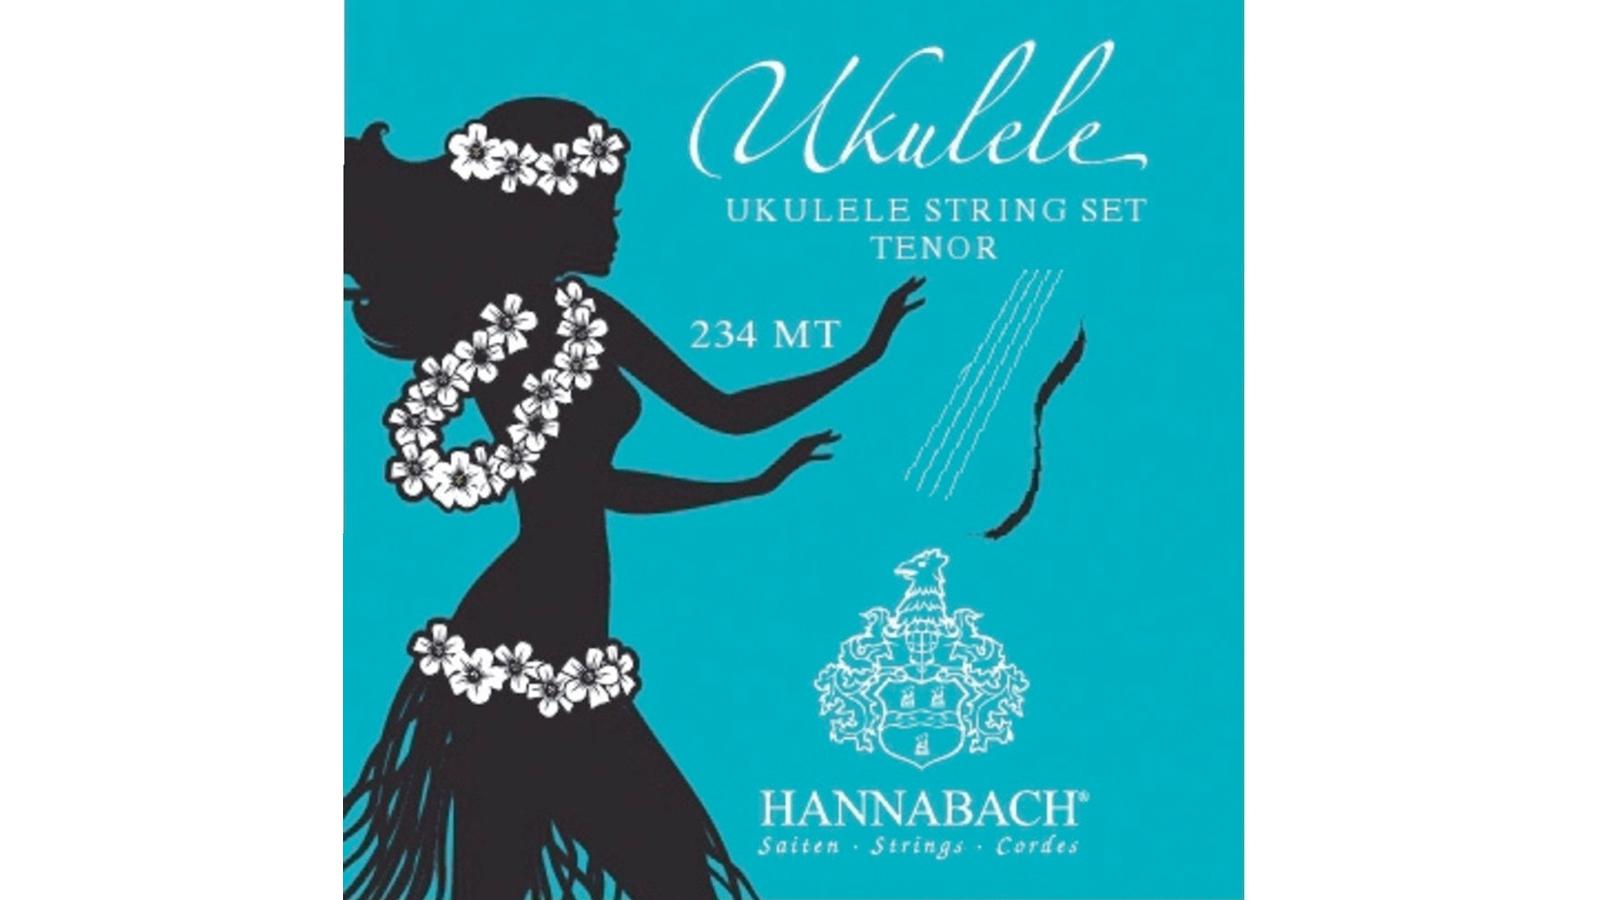 Hannabach 234MT Saiten für Tenor Ukulele